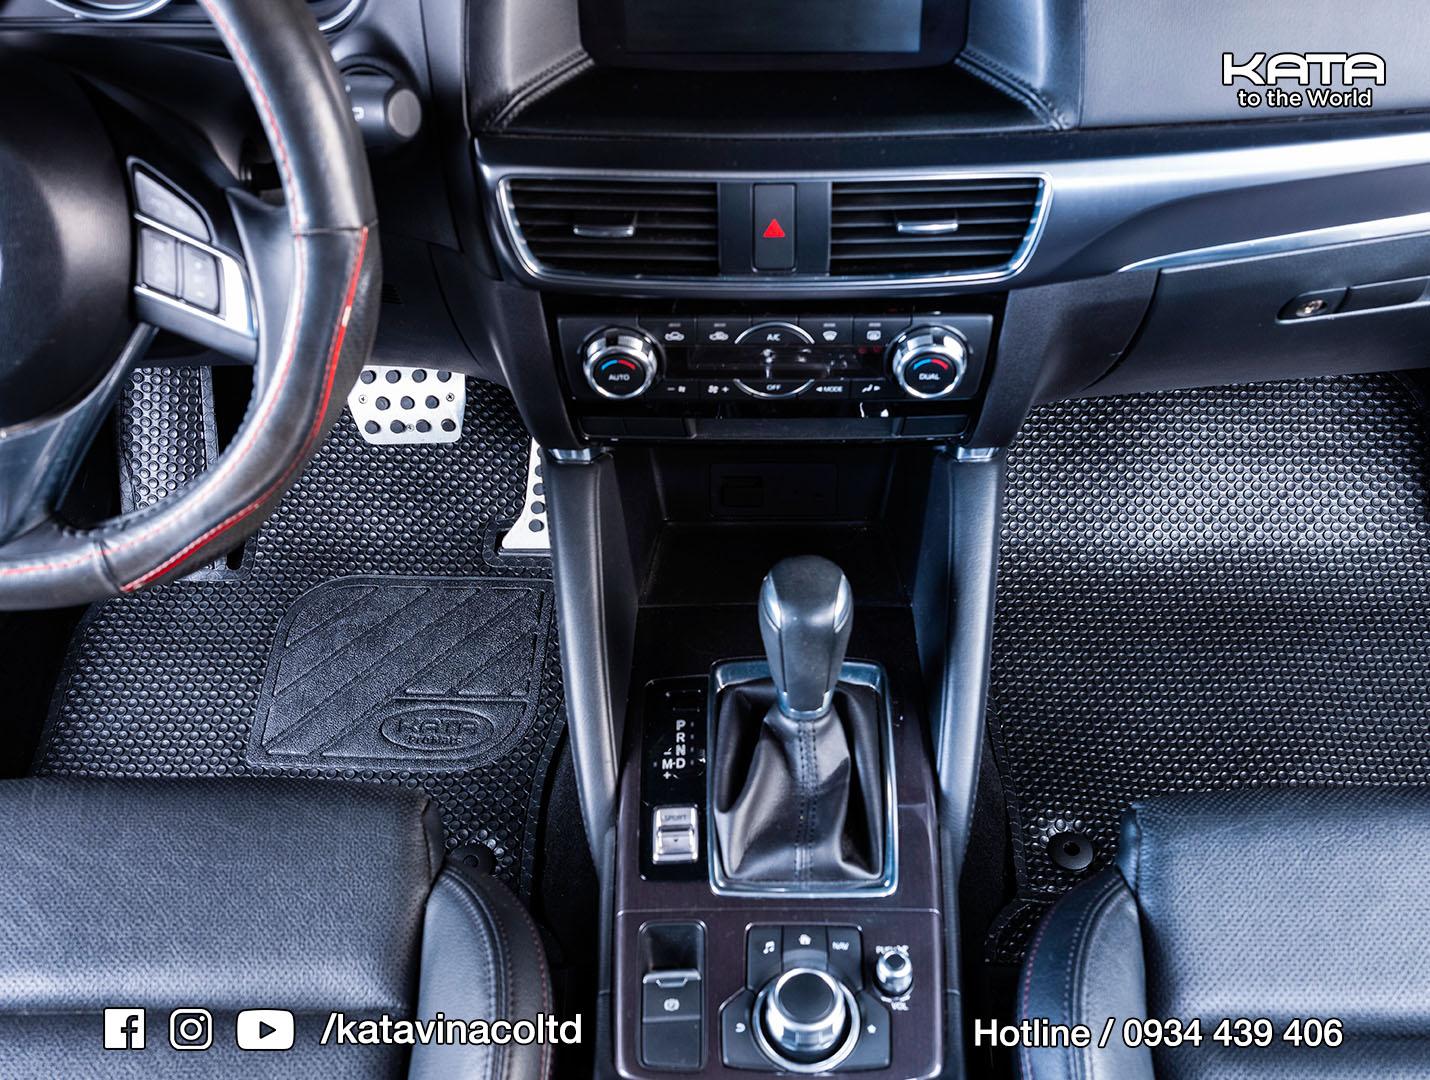 Thảm lót sàn Mazda CX5 bản KATA Pro